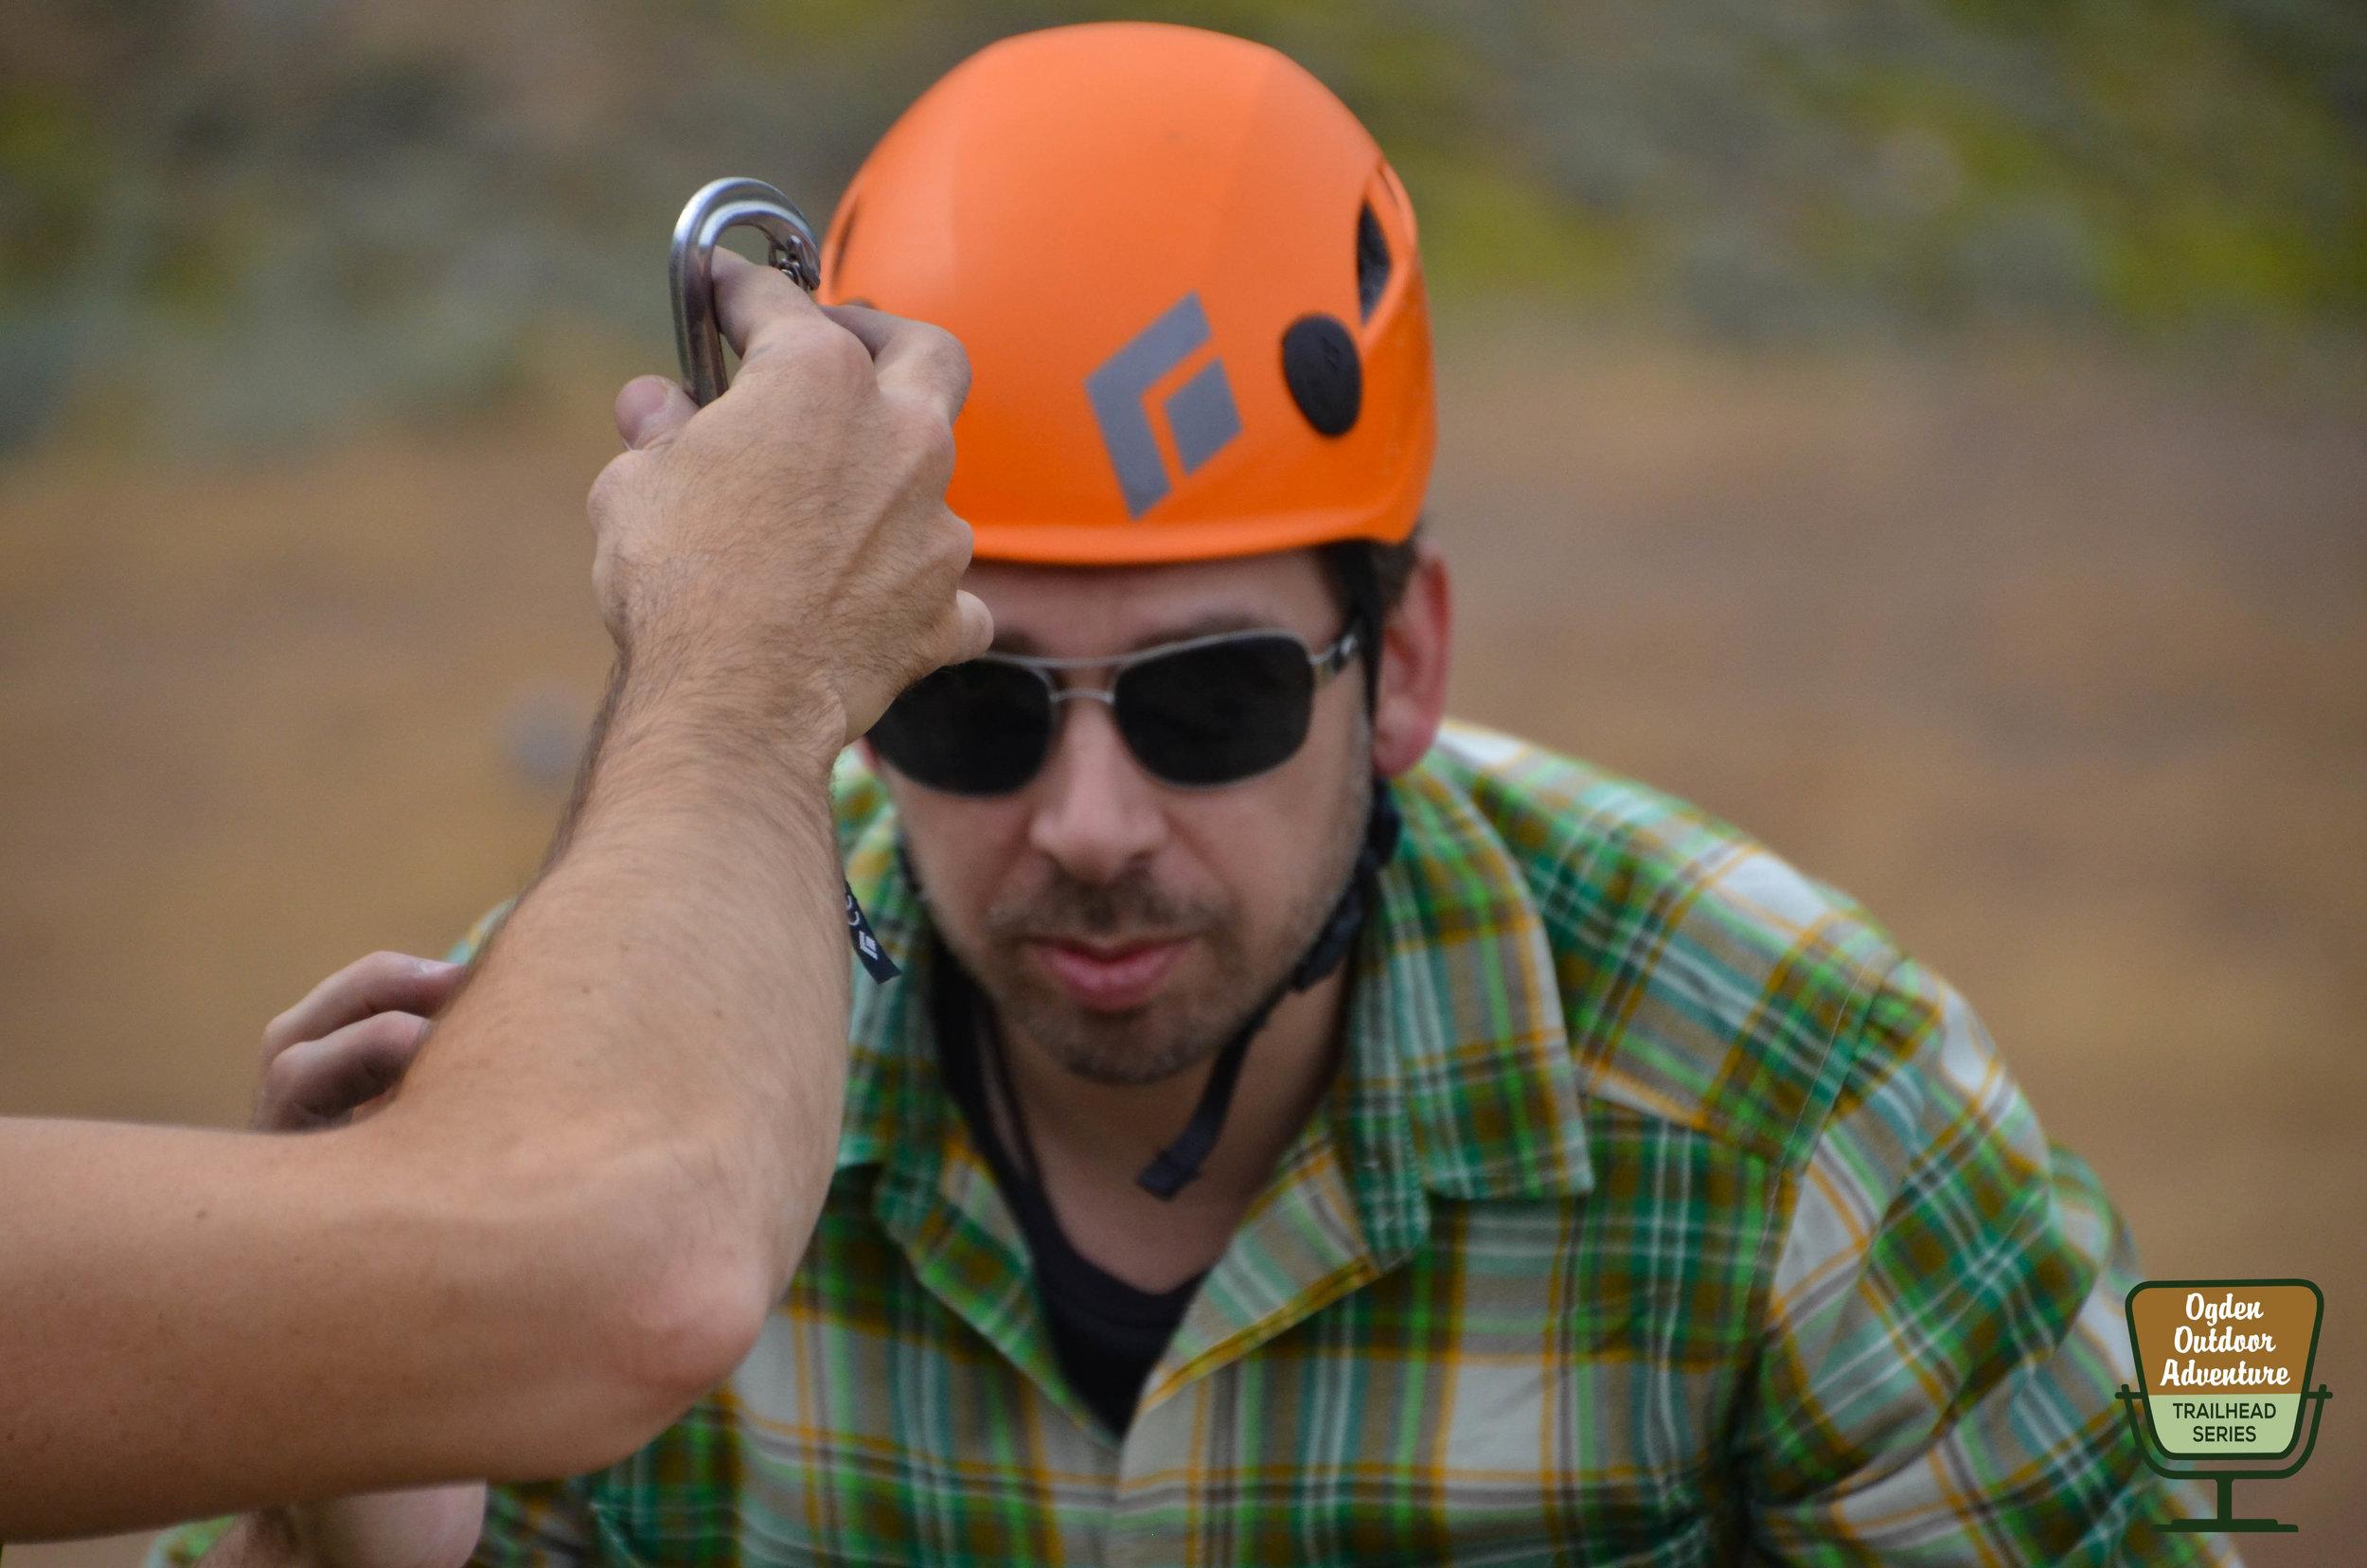 Ogden Outdoor Adventure Show 248 - Bear House Mountaineering-10.jpg